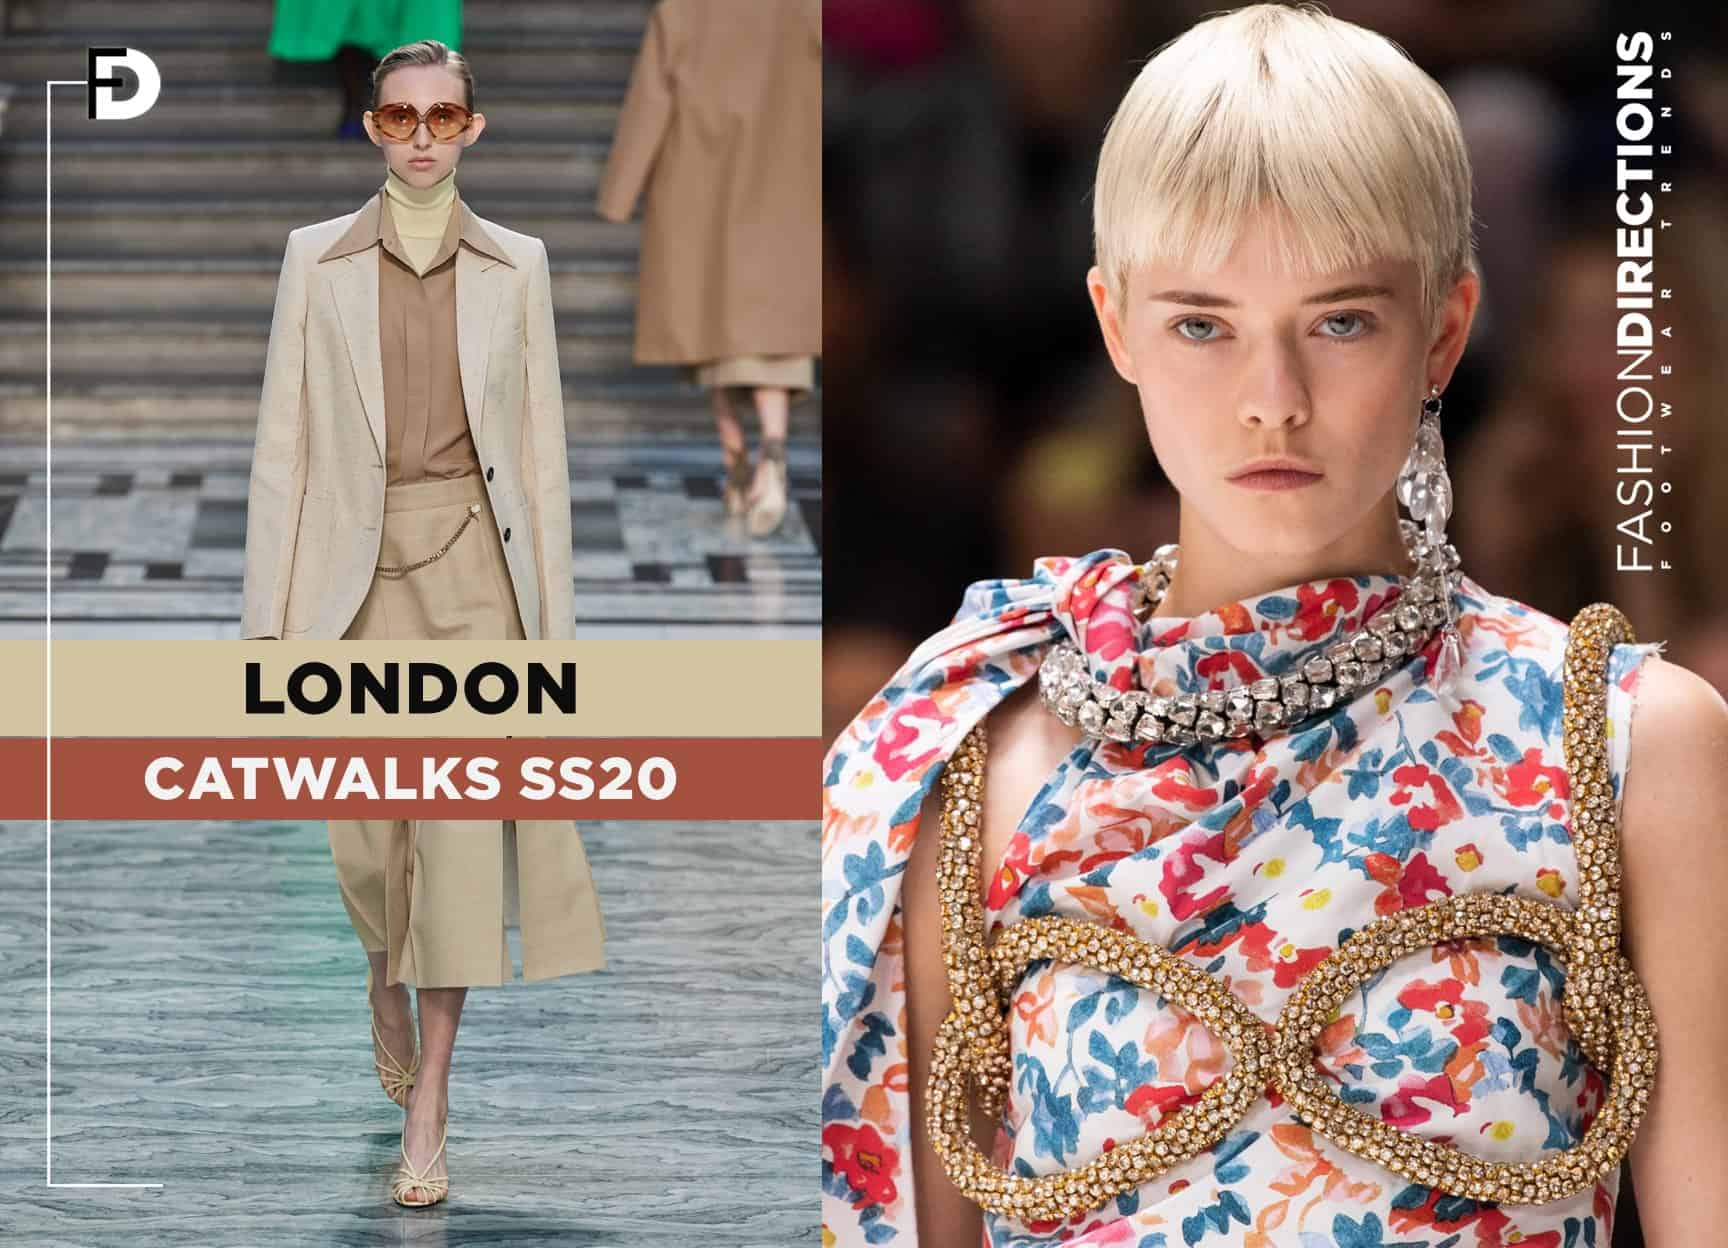 Catwalks London SS20